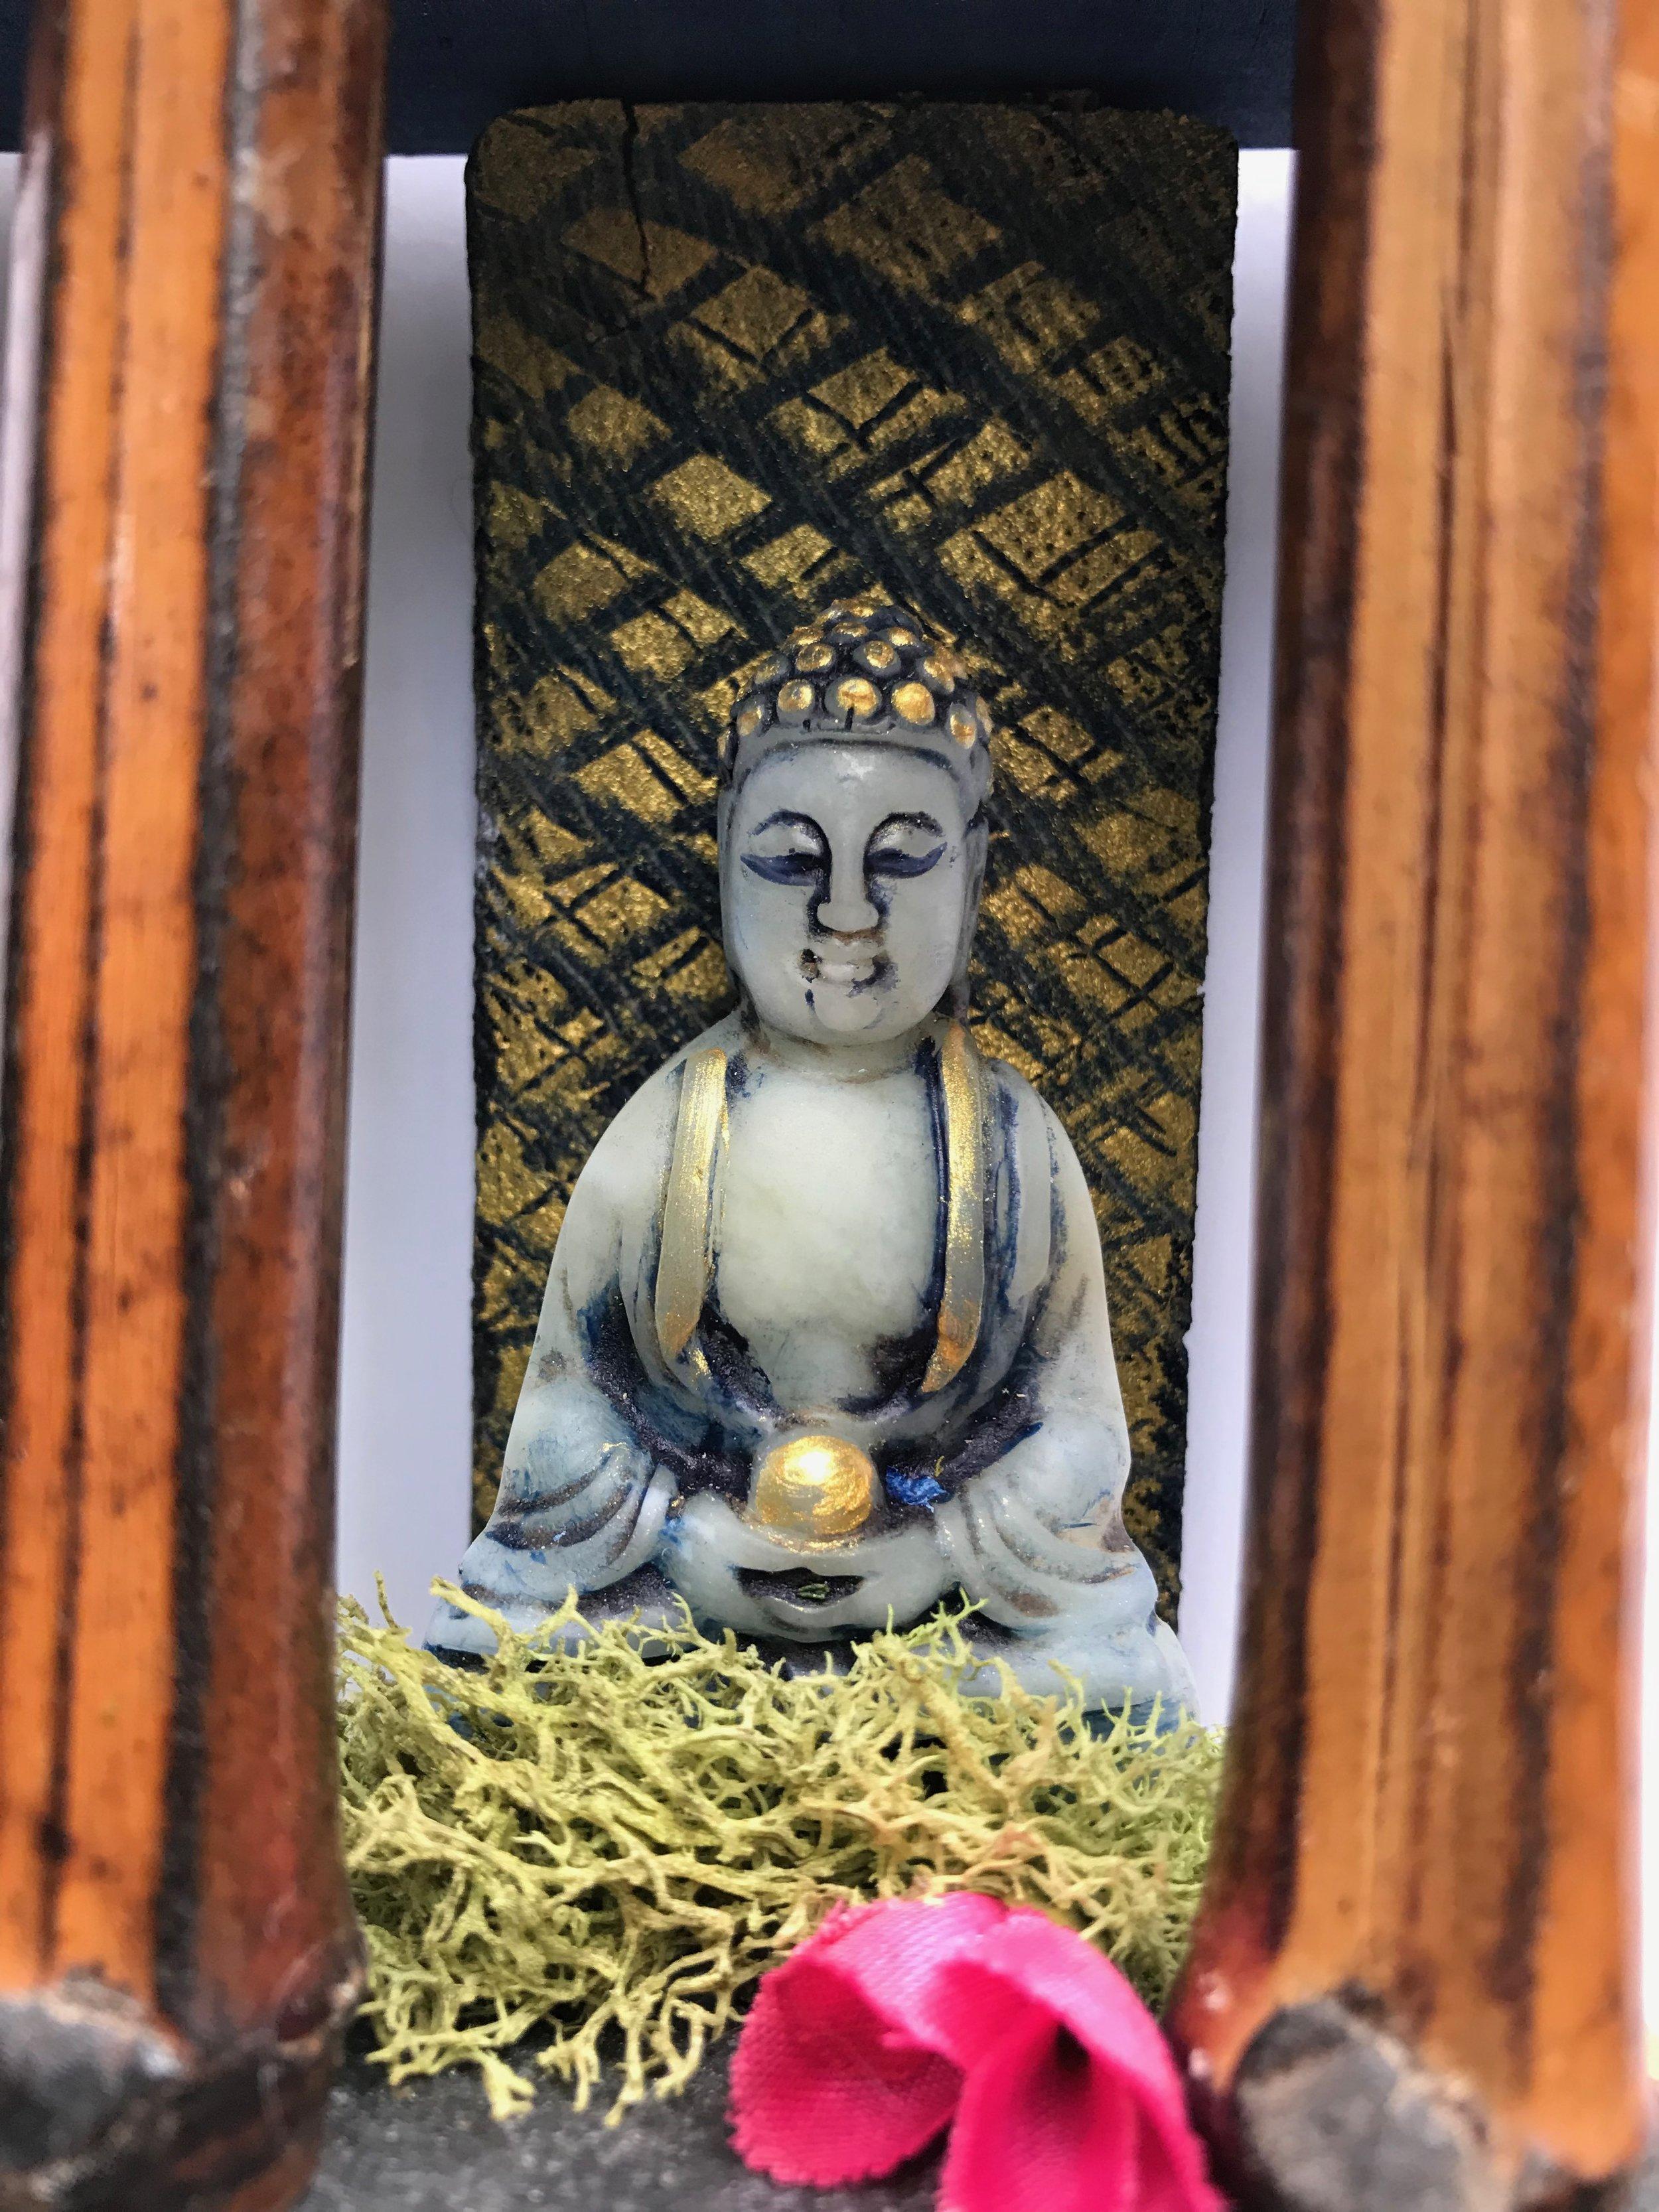 Laura-Trisiano-Beyond-mixed-media-assemblage-small-sculpture-walltar-altar-temple-wall-sculpture-yogi-art-meditative-art-sacred-art-shrine-Buddha-yogic-art-yogini-art-NJ-artist-peaceful-meditation-Tibetan-bell-found-object-jade-bamboo-6.jpg